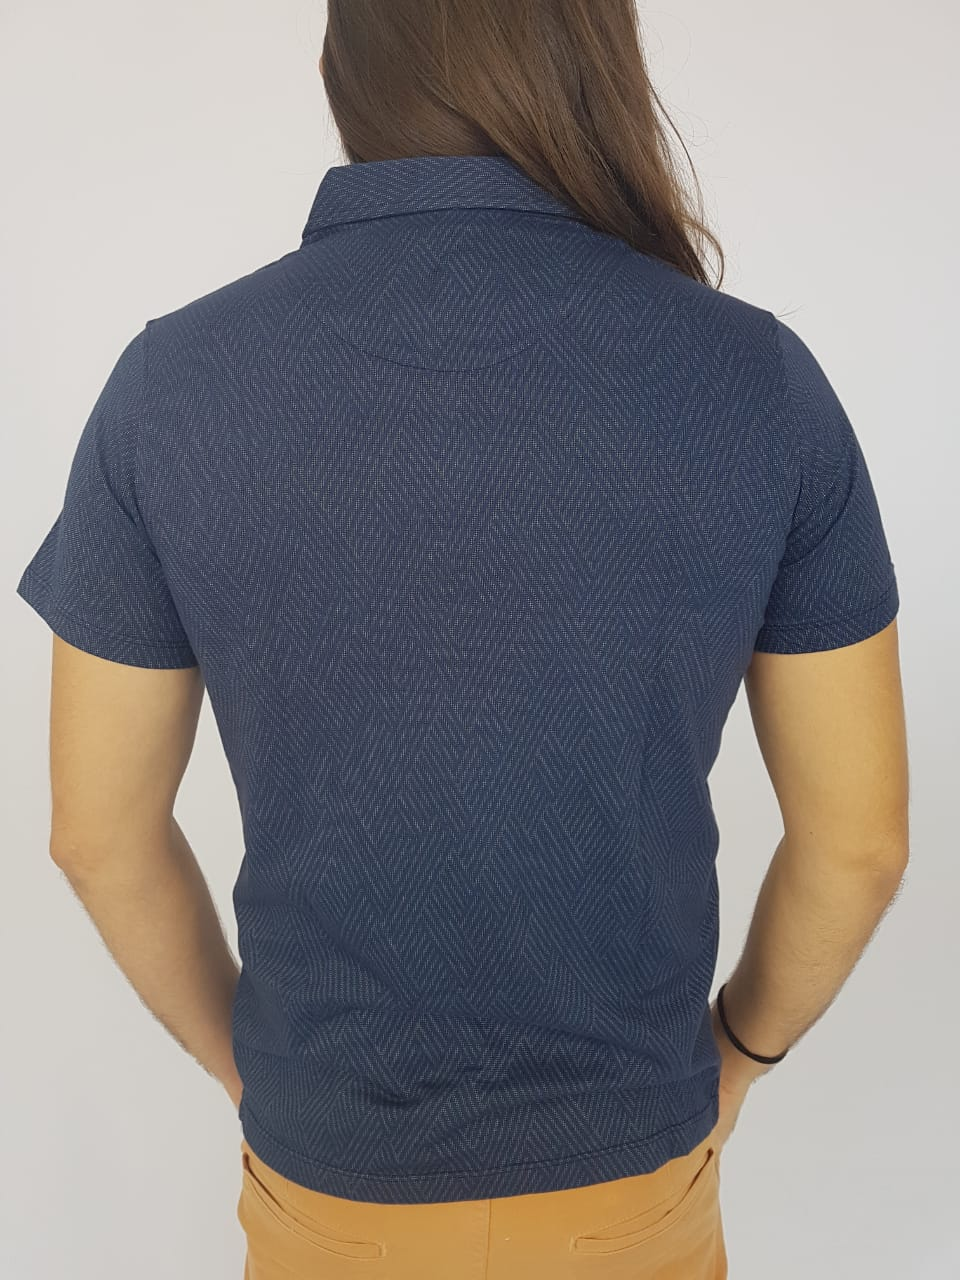 Camiseta Masculina Ogochi Polo Manga Curta Lisa